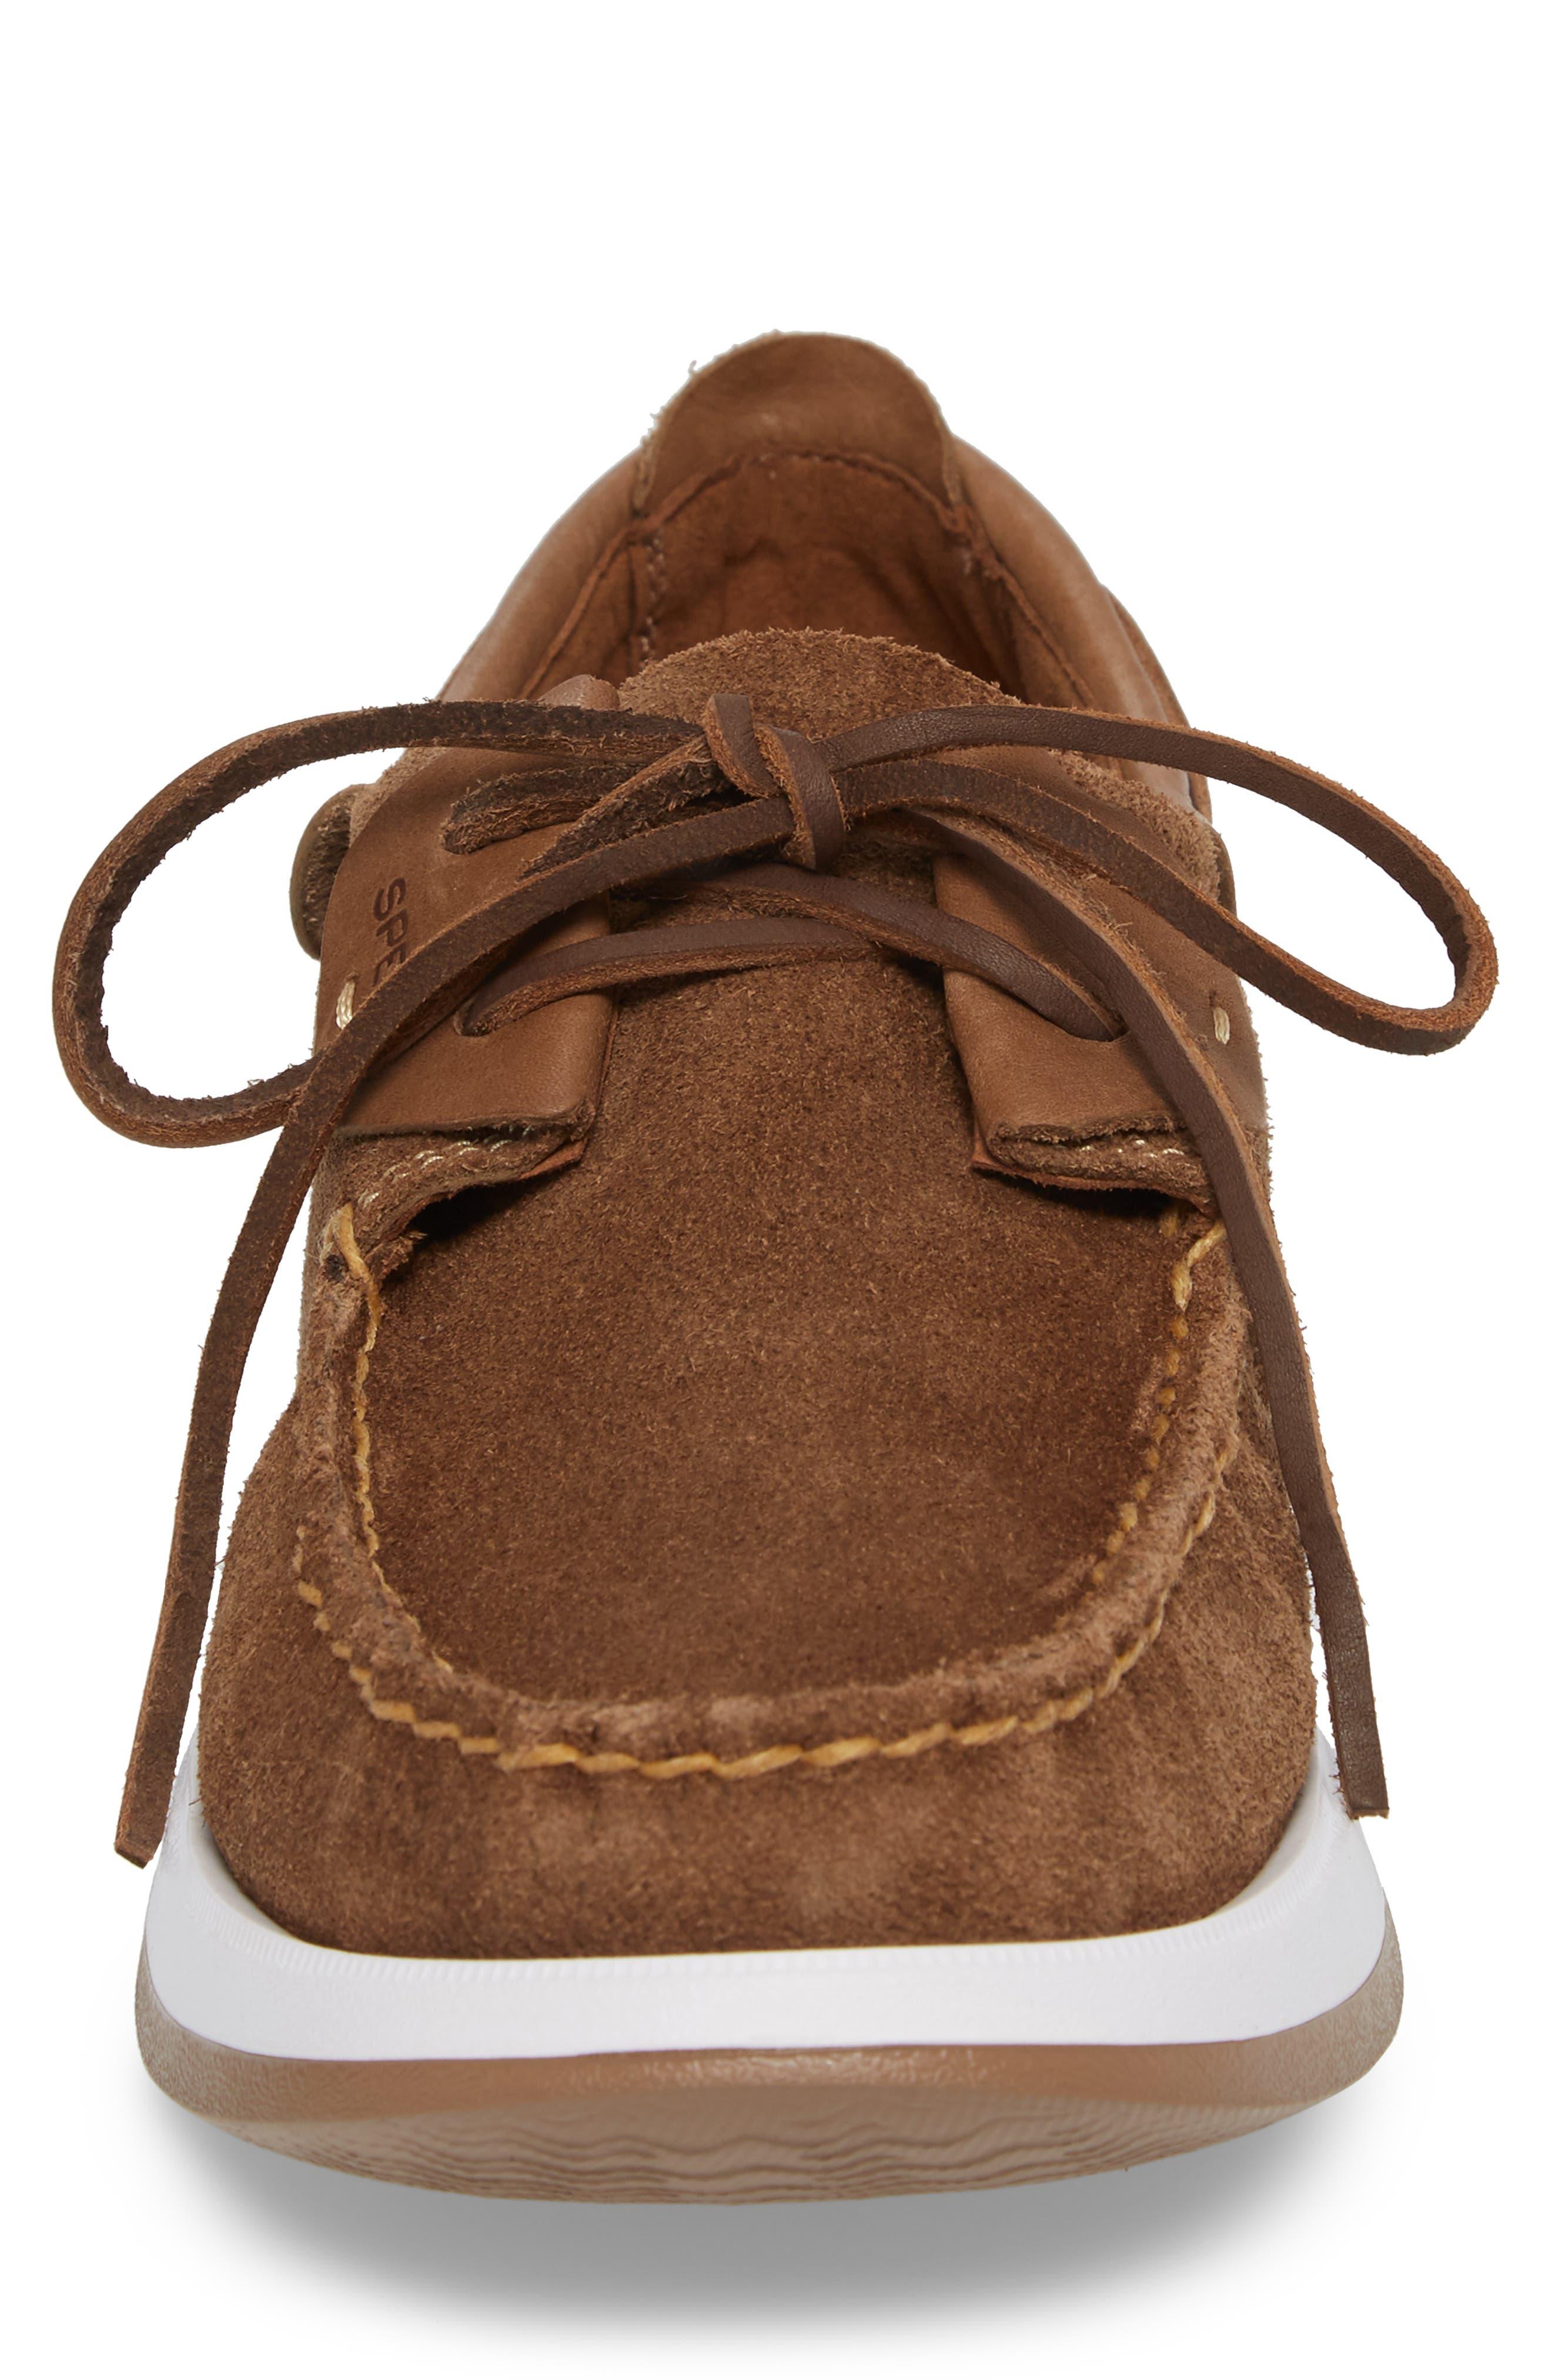 Caspian Boat Shoe,                             Alternate thumbnail 4, color,                             Tan Leather/ Suede